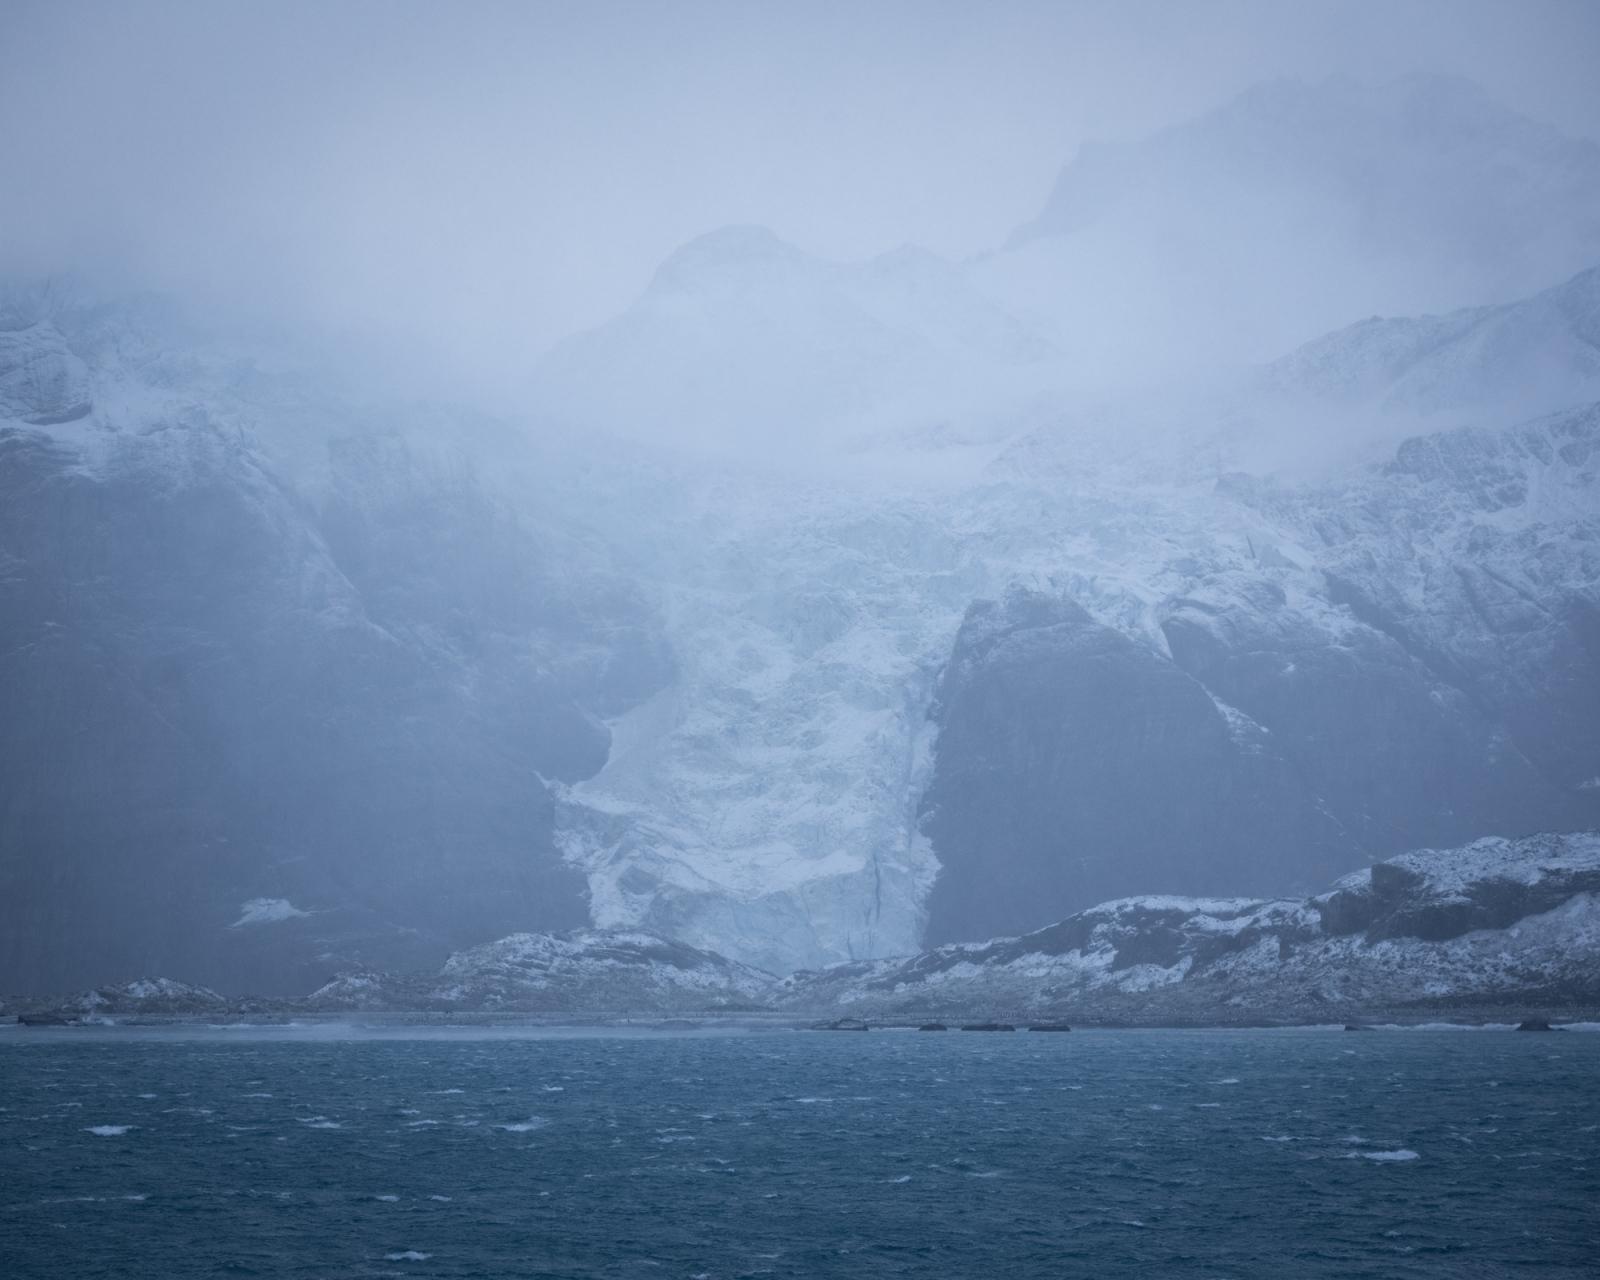 Art and Documentary Photography - Loading 0_Antarctica_UPLOAD_acaciajohnson_25.jpg